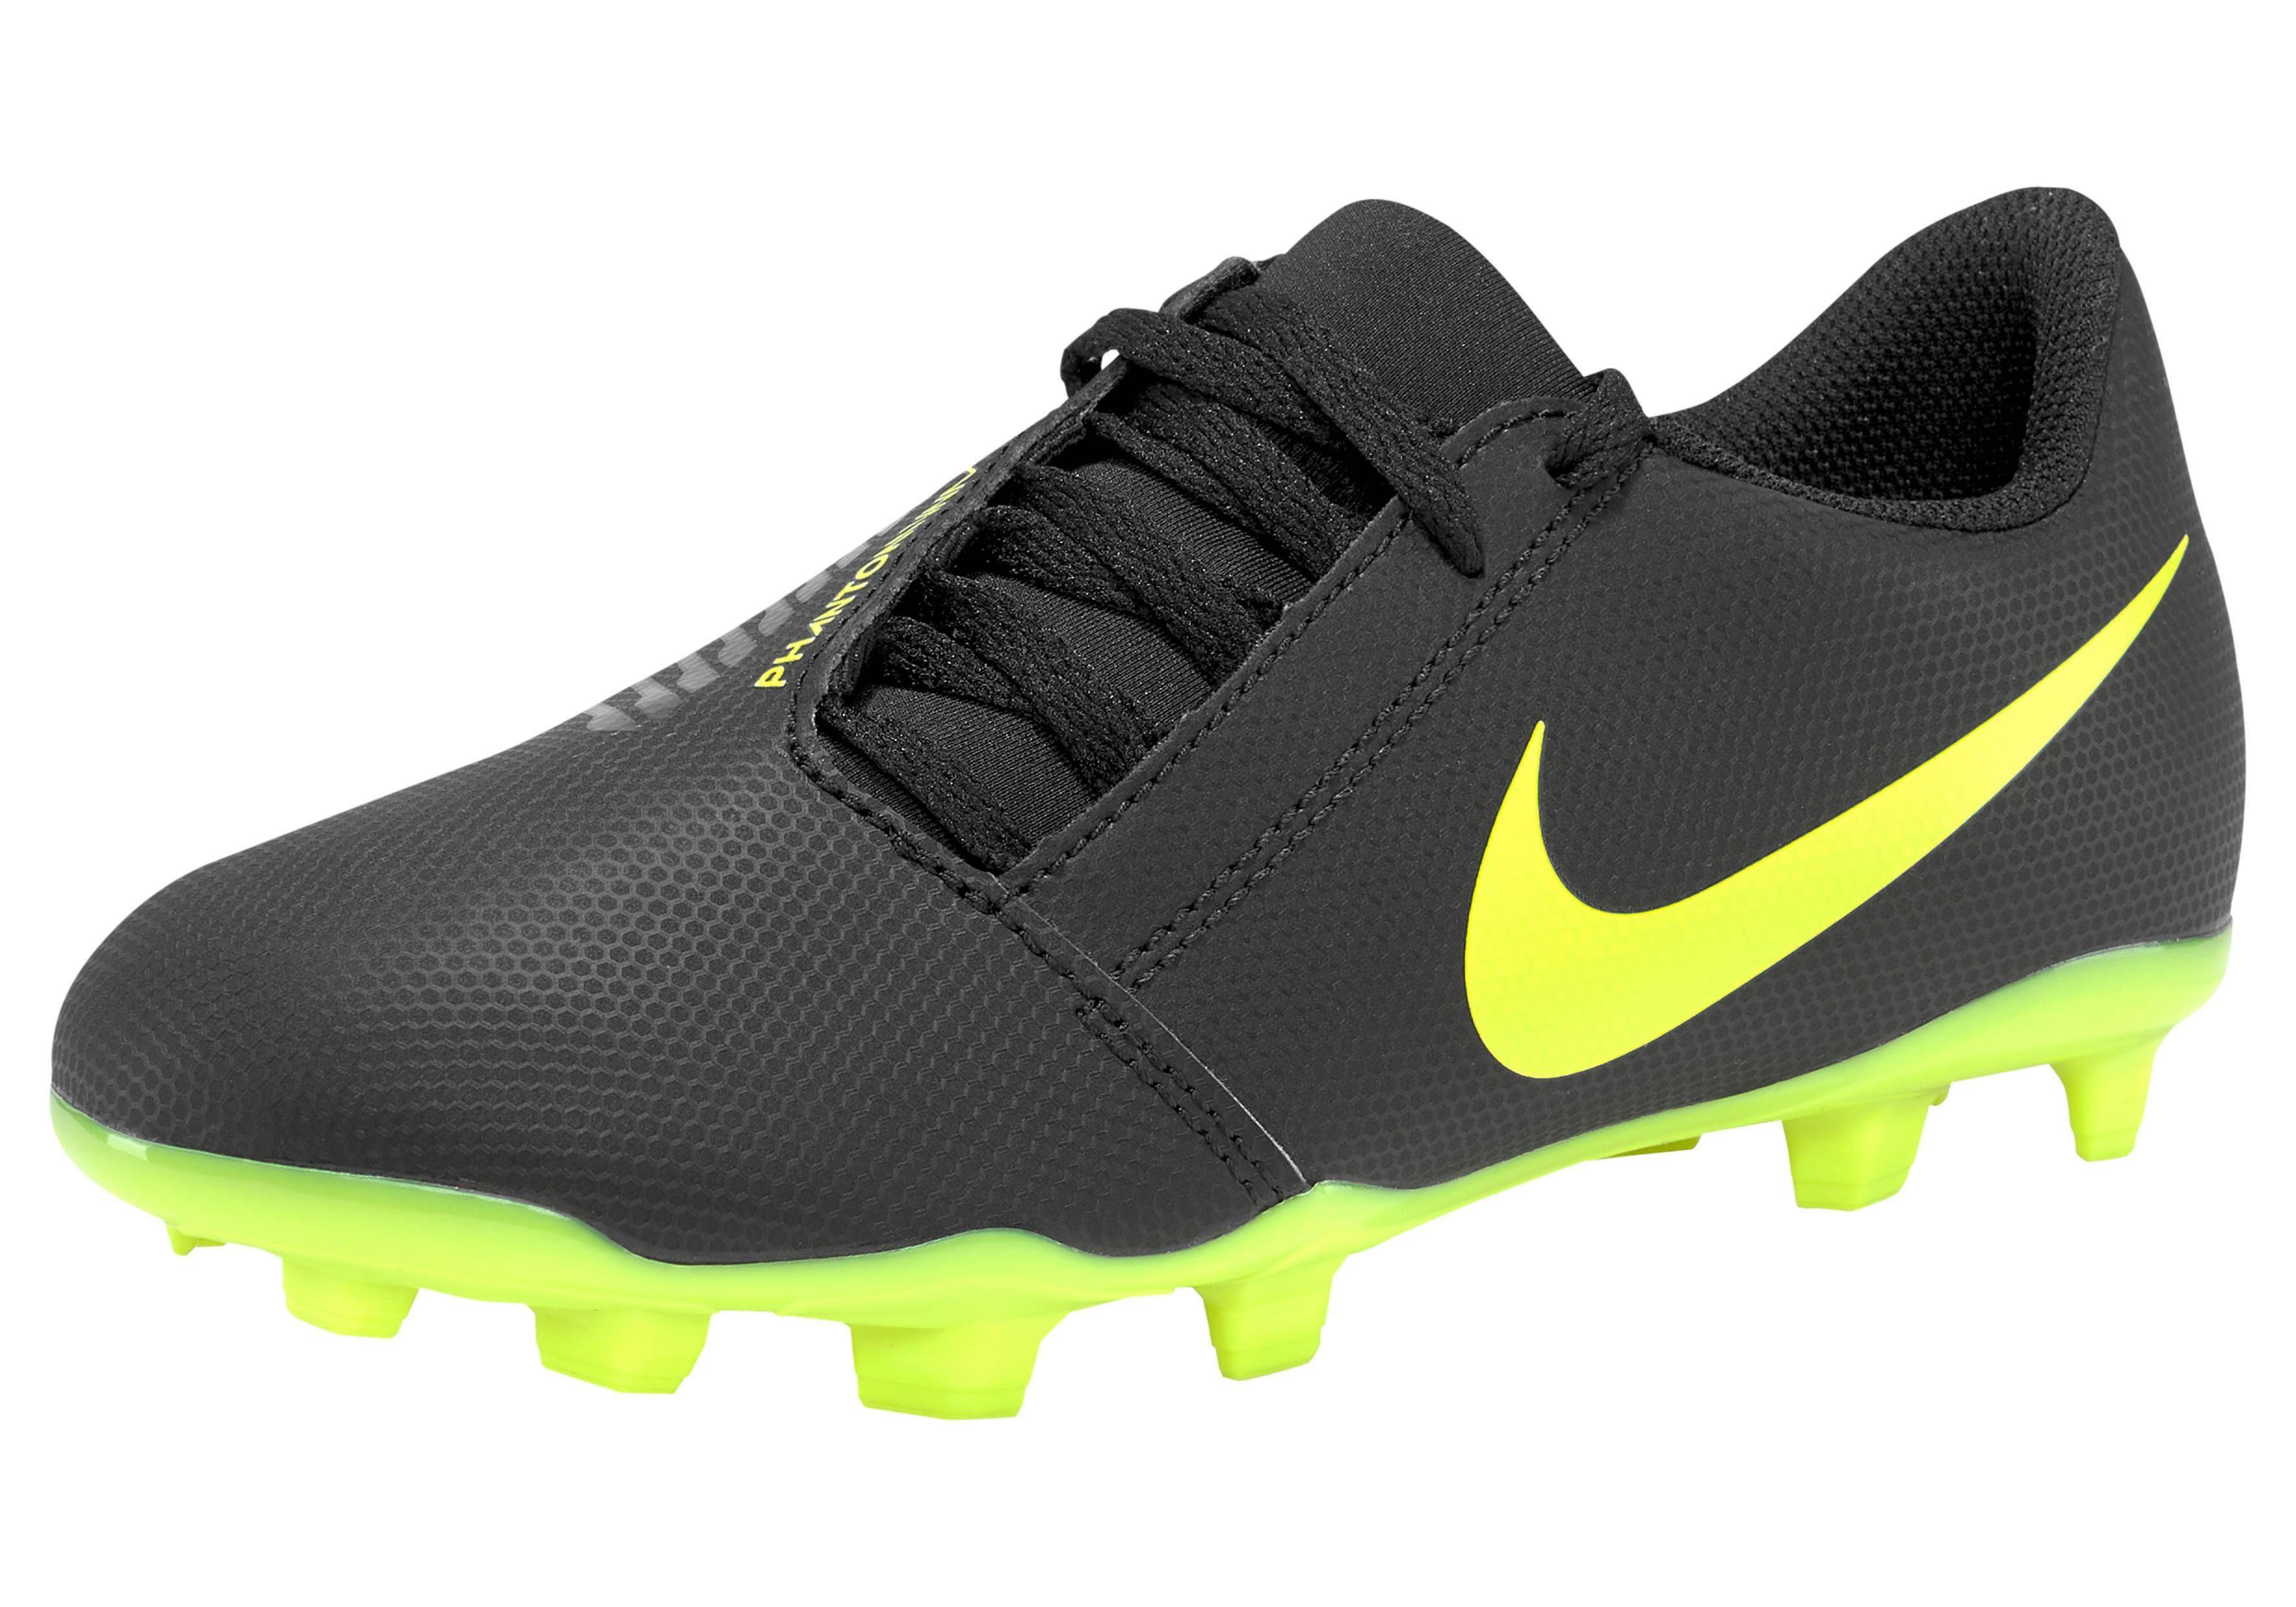 32 33 34 35 36 37 38 39 Multinocke Nike Fußballschuhe